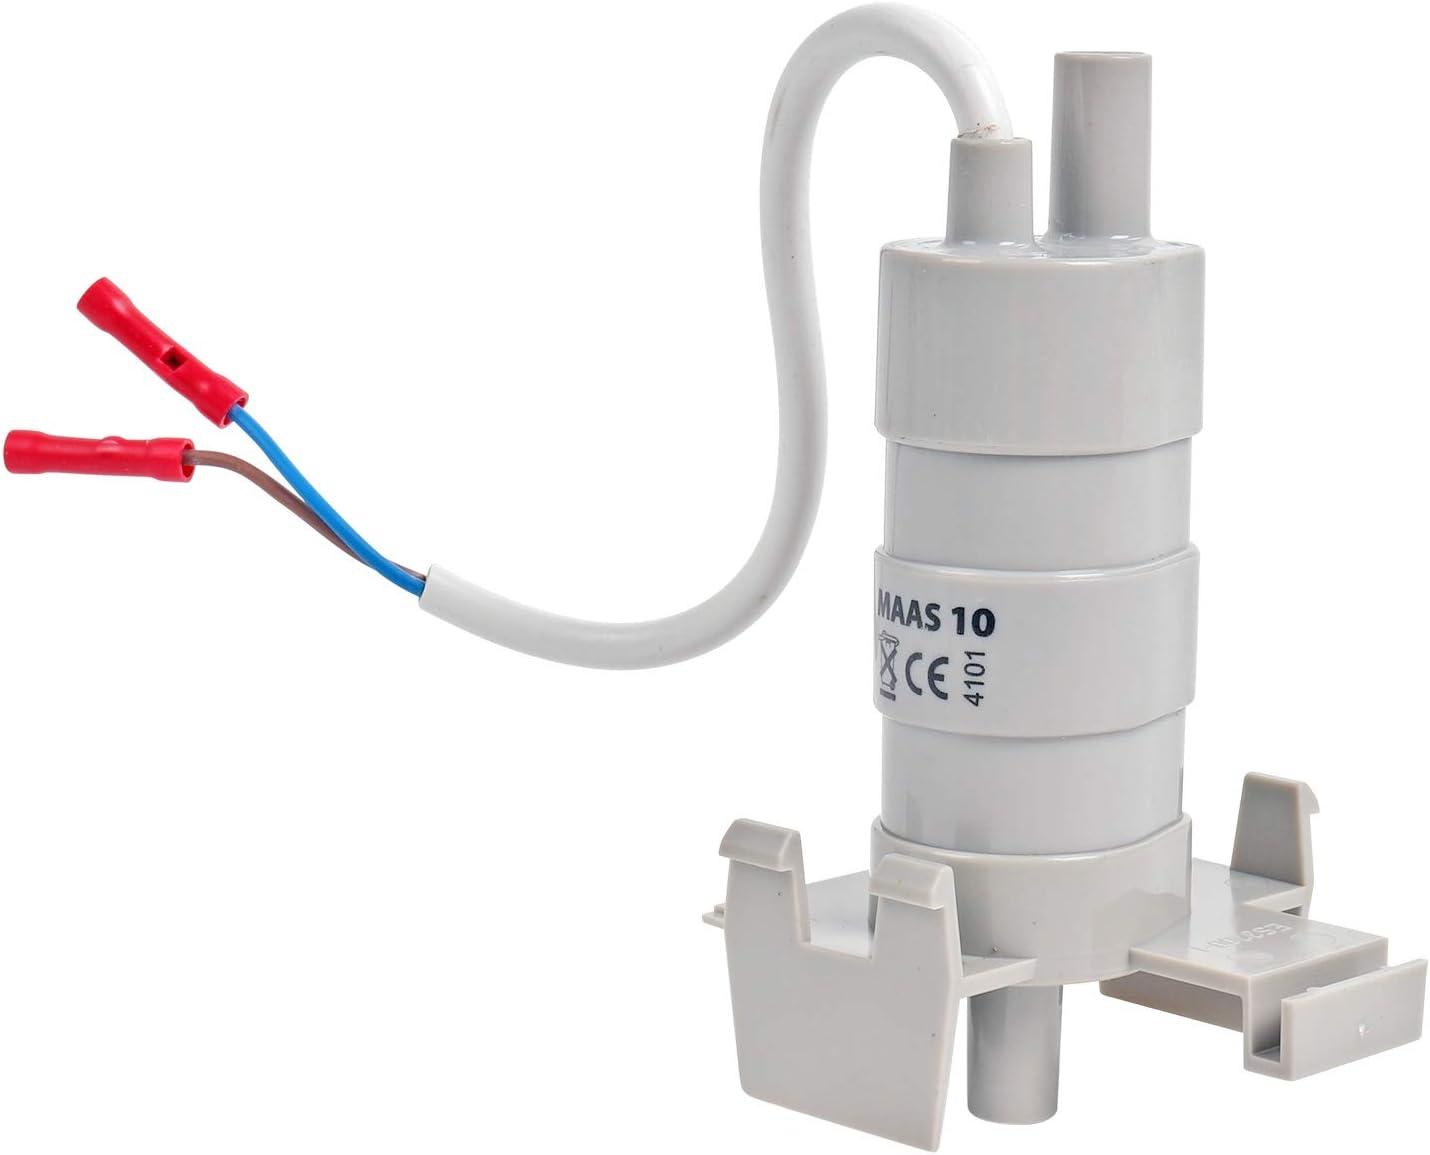 Wasser Pumpe passend f/ür THETFORD C250 C260 Pumpensatz Repsatz Sp/ülpumpe